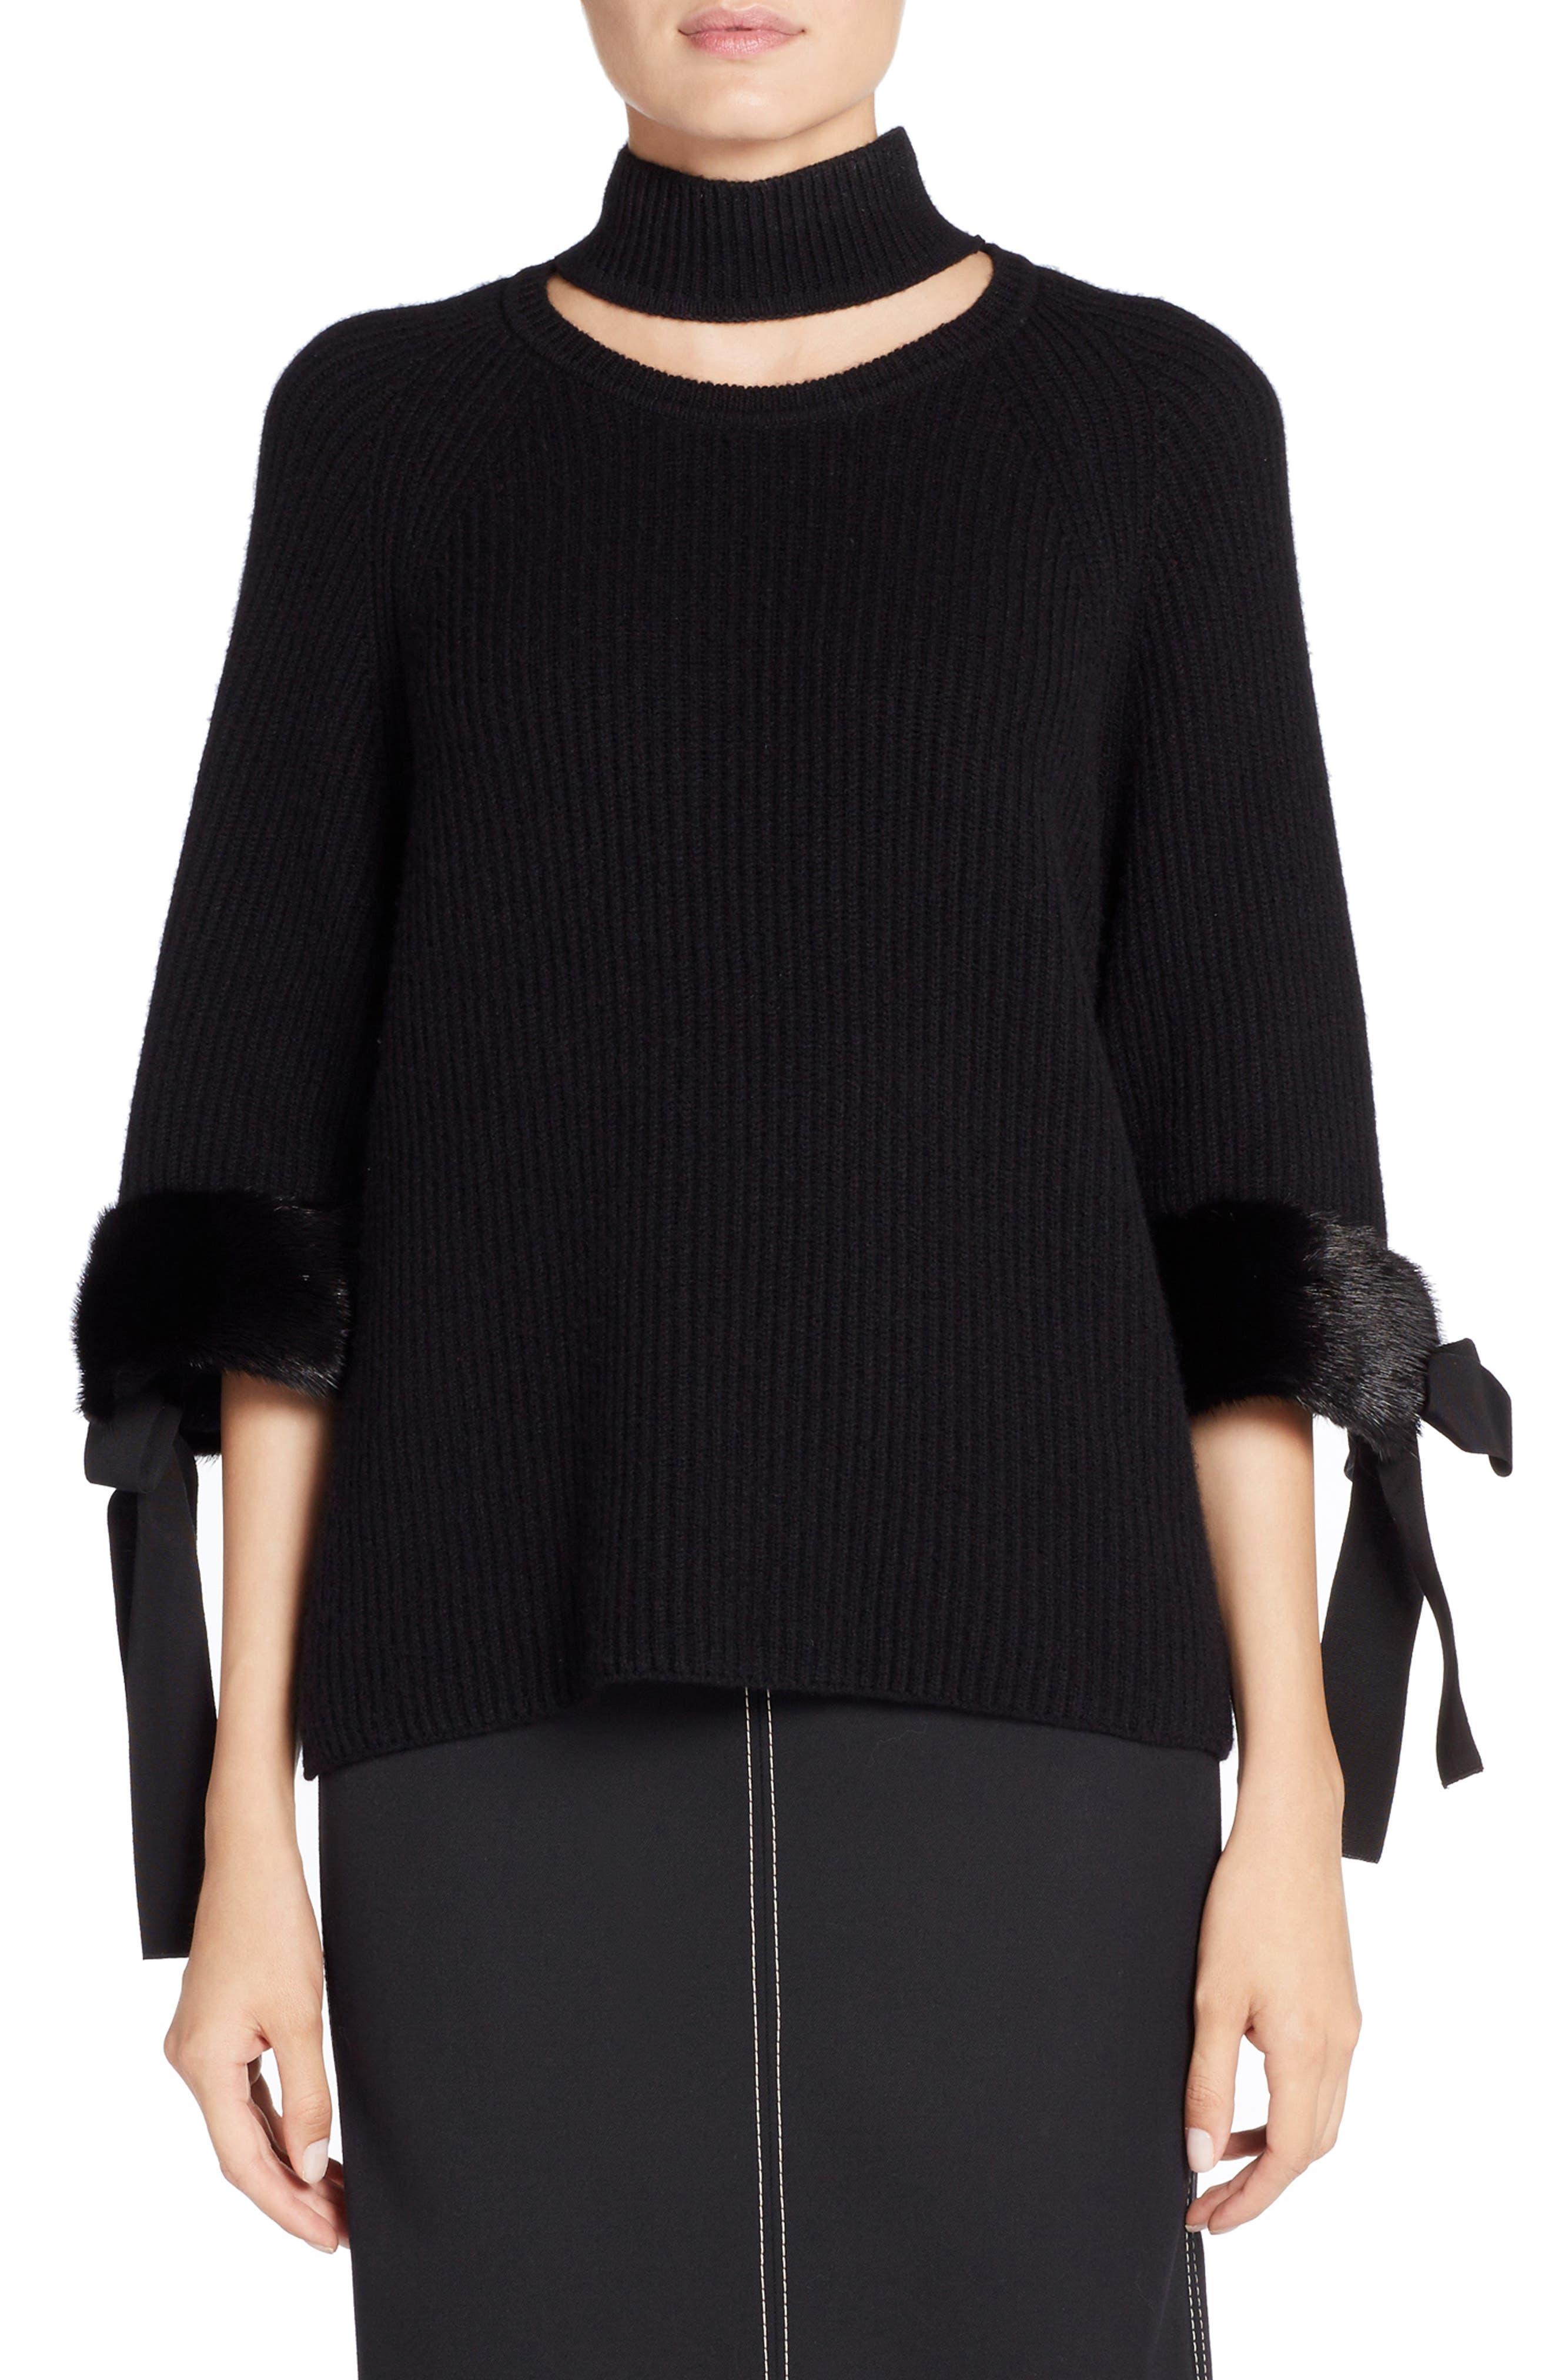 Alternate Image 1 Selected - Fendi Cashmere & Genuine Mink Fur Sweater